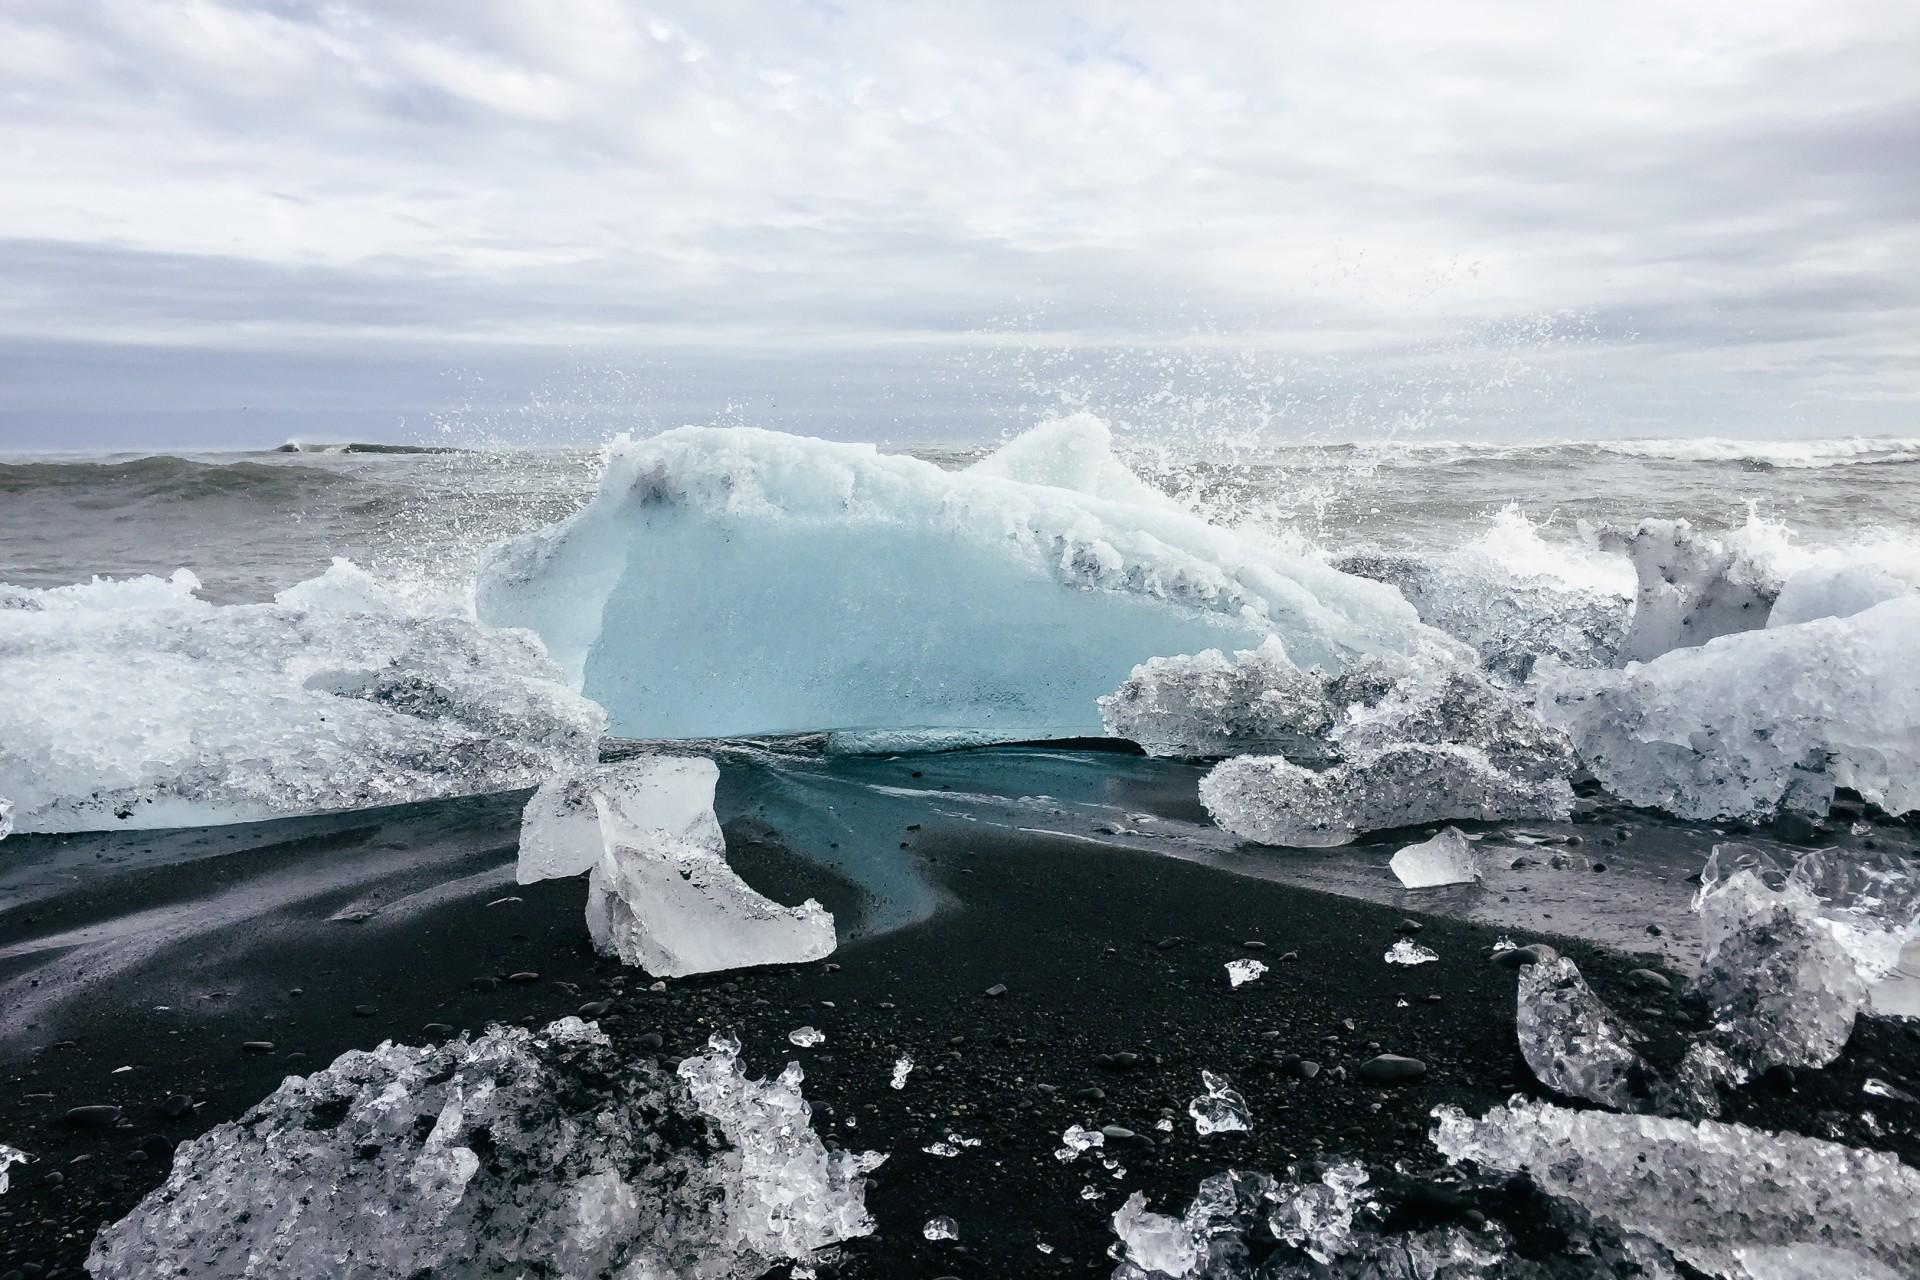 Diamond Beacht at Jökulsárlón Glacier Lagoon in Iceland